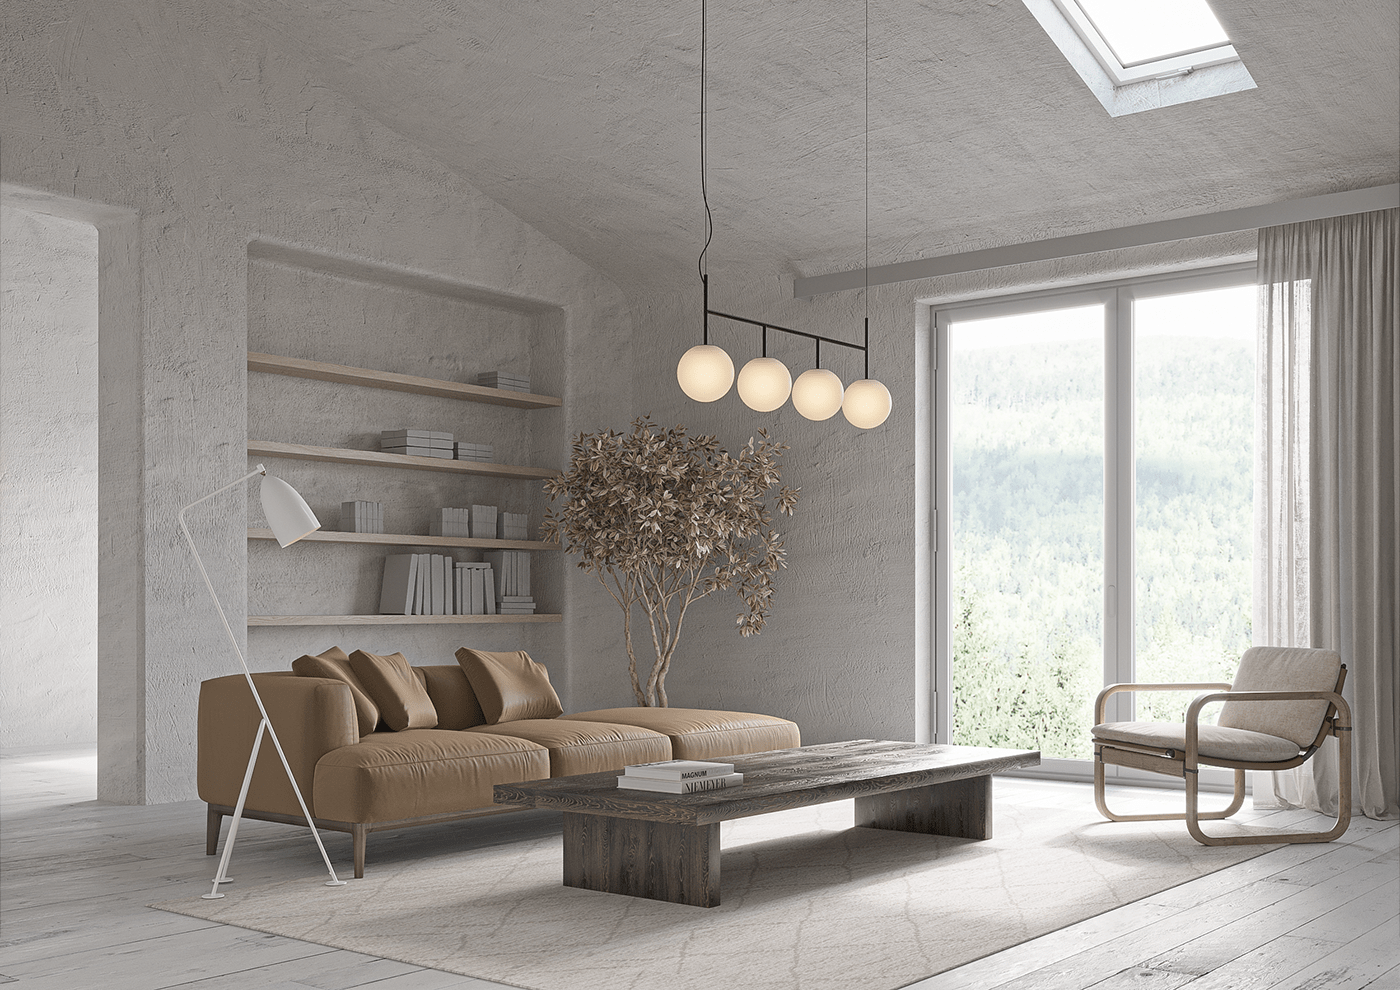 3D Visualization design design interior Design Visualization Interior interior design  Interior Visualization Render visualization